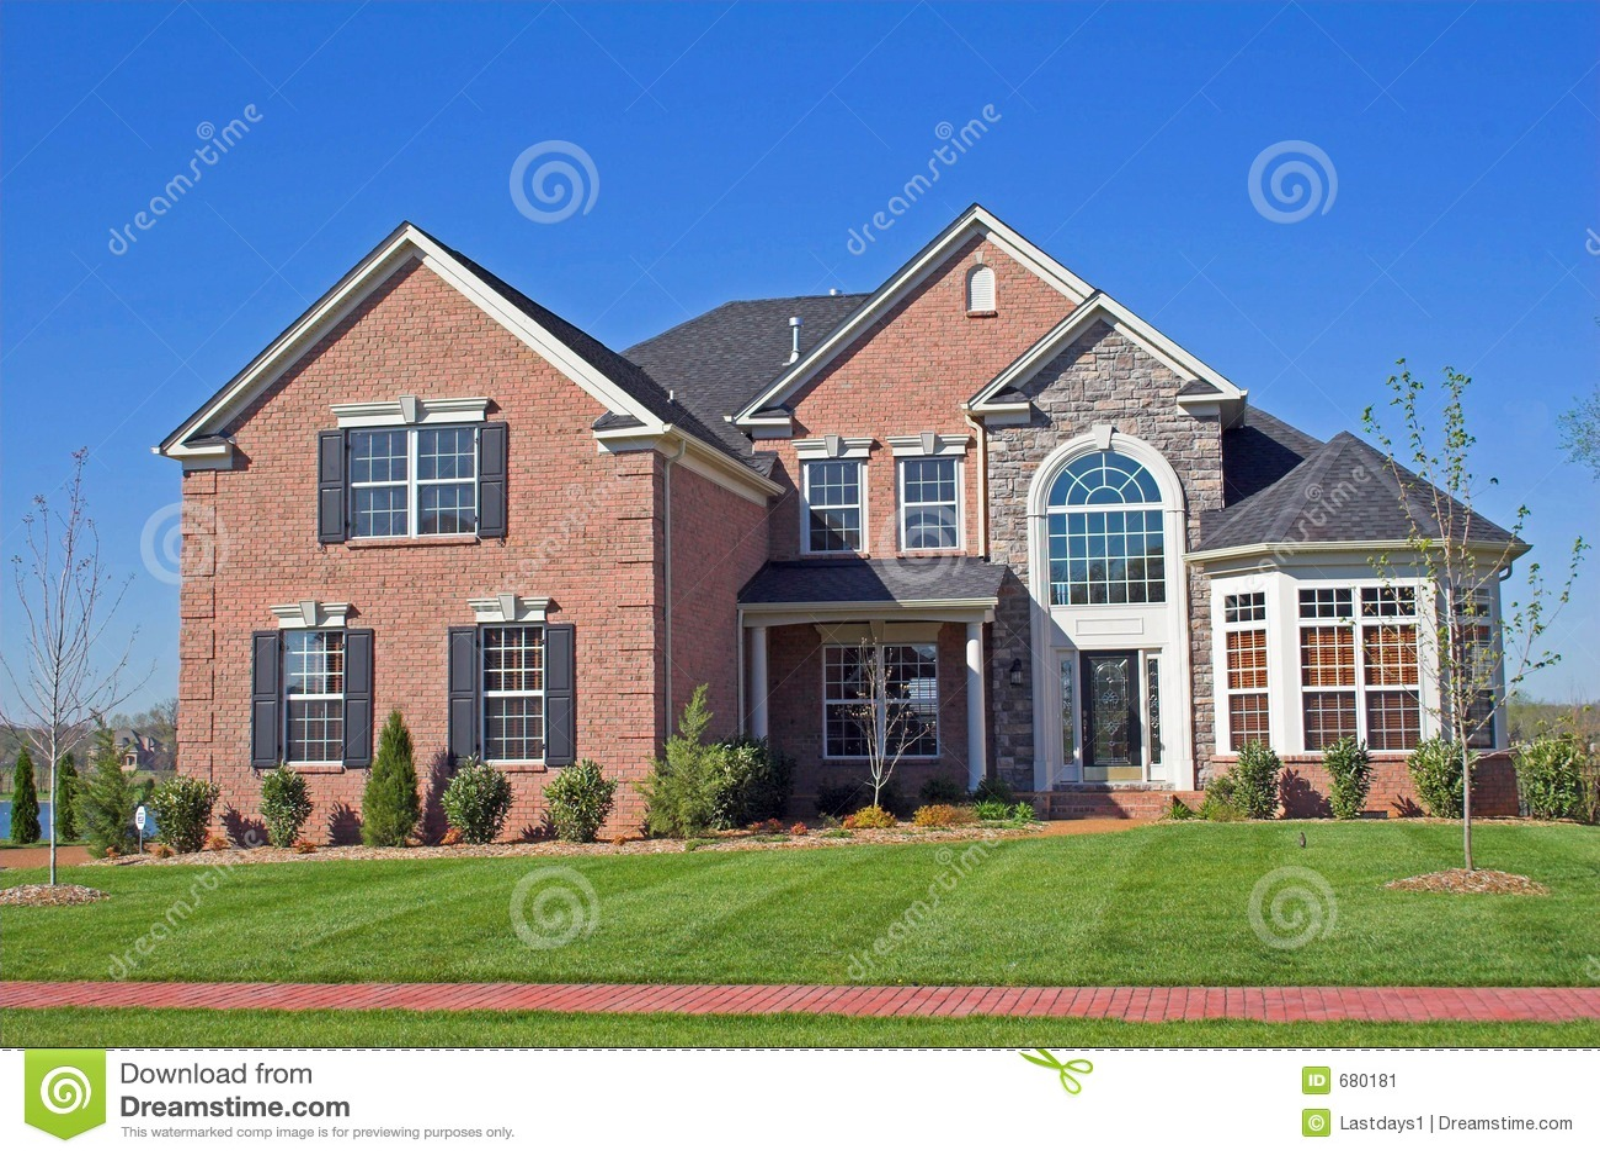 Beautiful homes series 1d stock image image 680181 - Beautiful home image ...